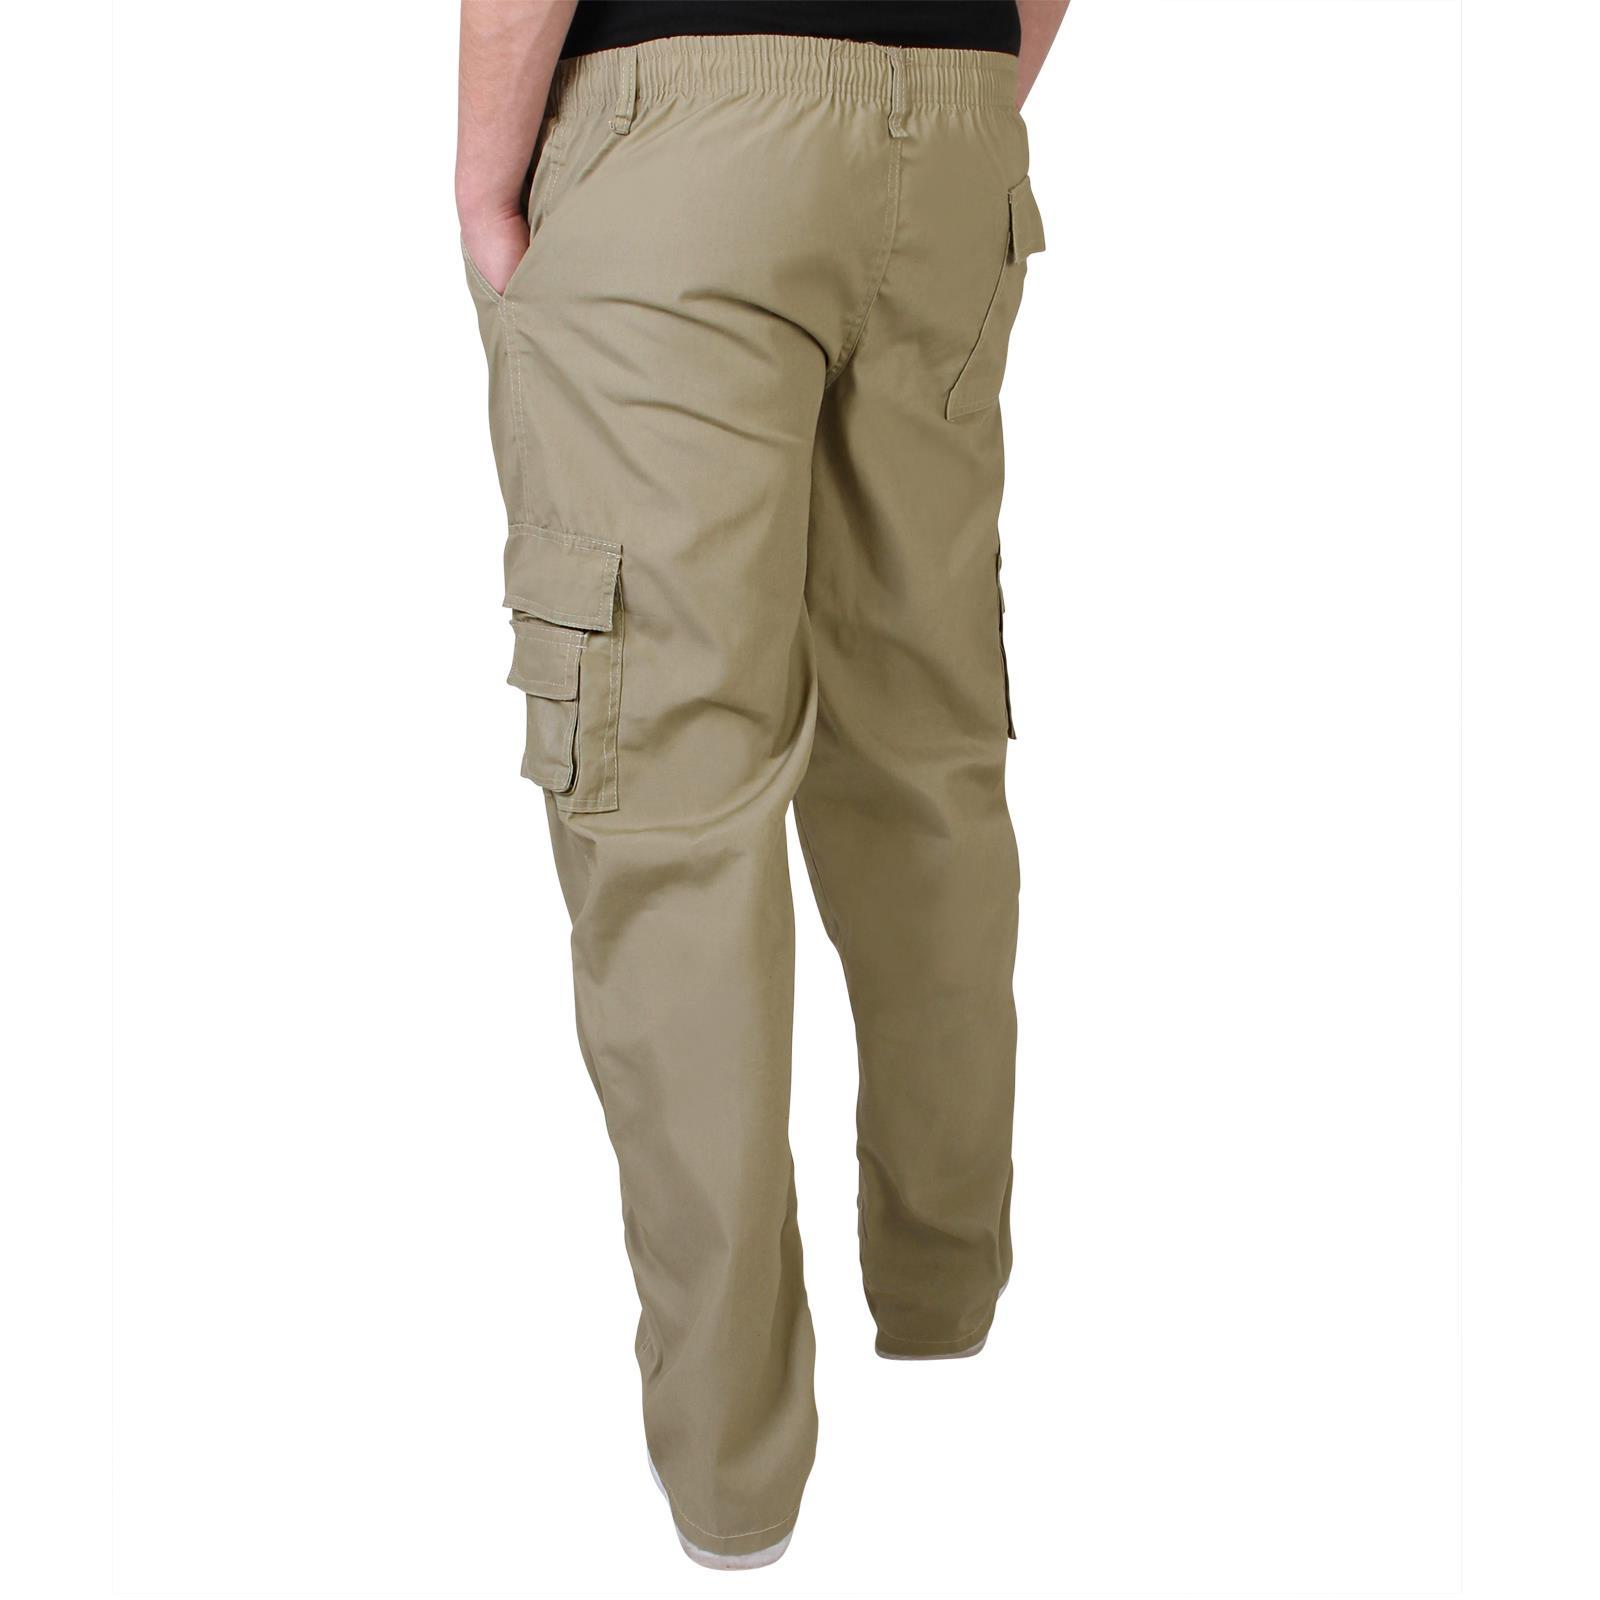 Pantalones-Hombre-Estilo-Cargo-Militar-Combate-Multibolsillos-Casual miniatura 10